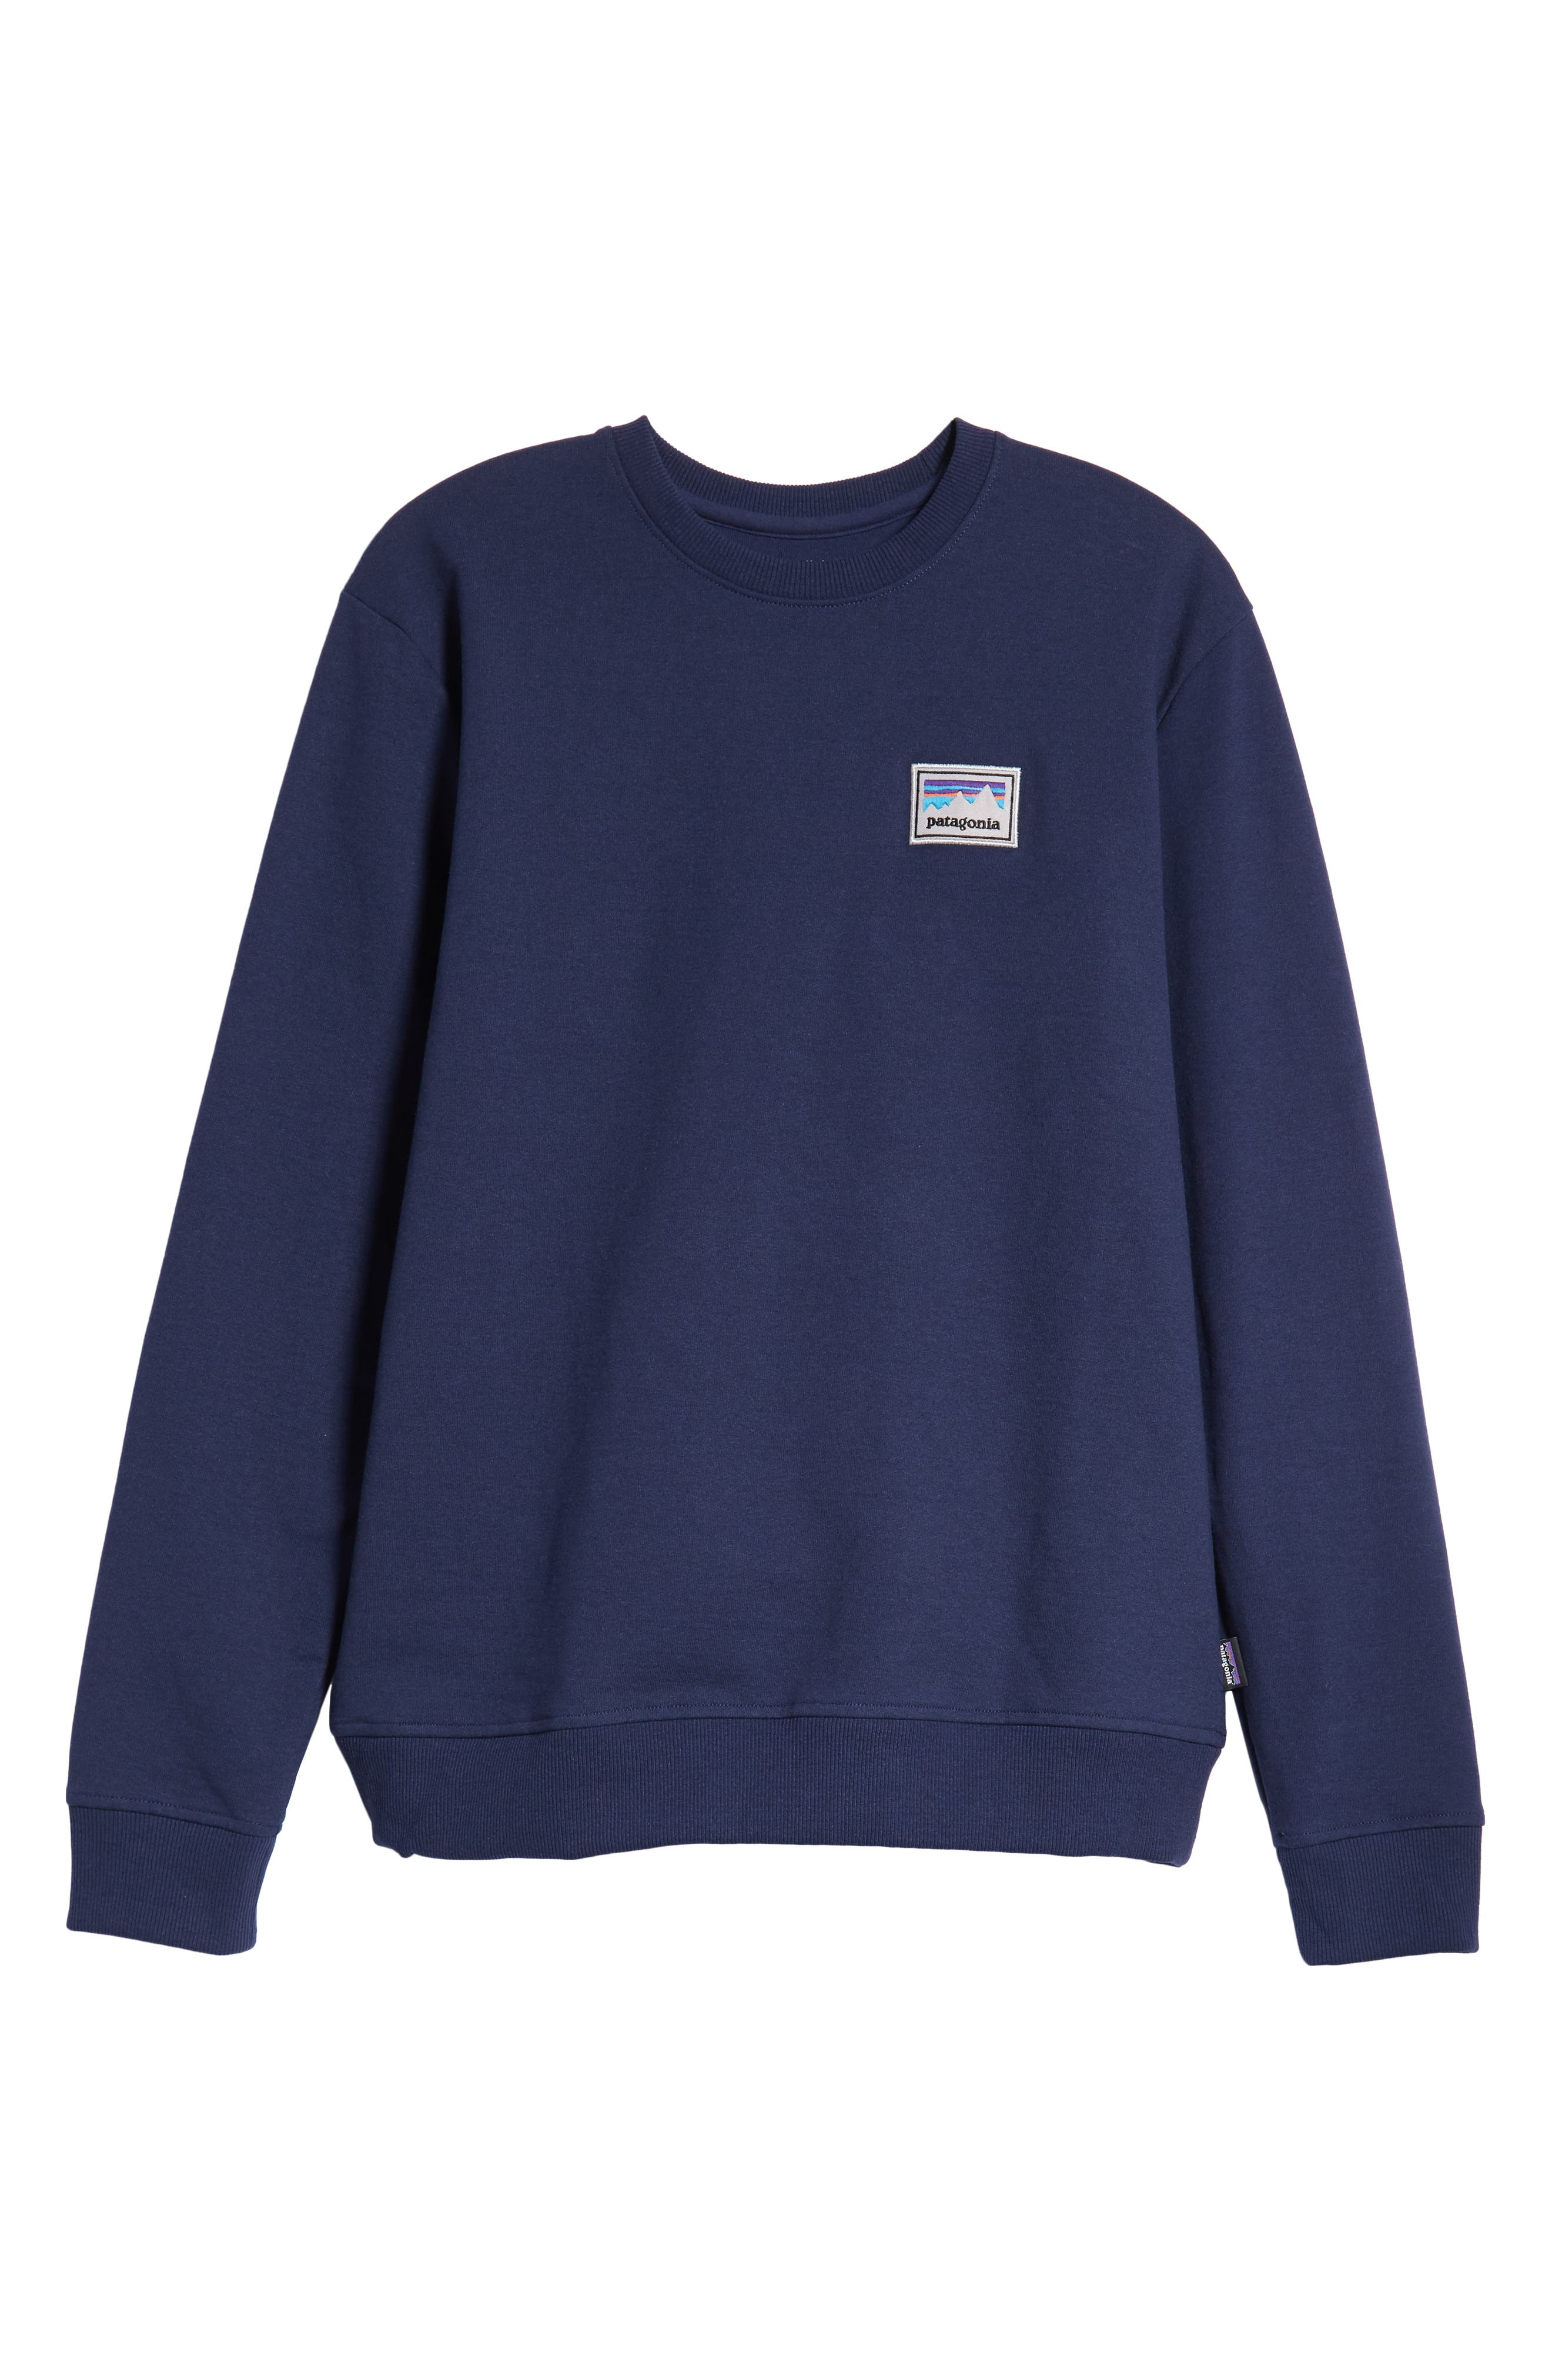 Shop Sticker Patch Uprisal Crew Sweatshirt,                             Alternate thumbnail 6, color,                             CLASSIC NAVY